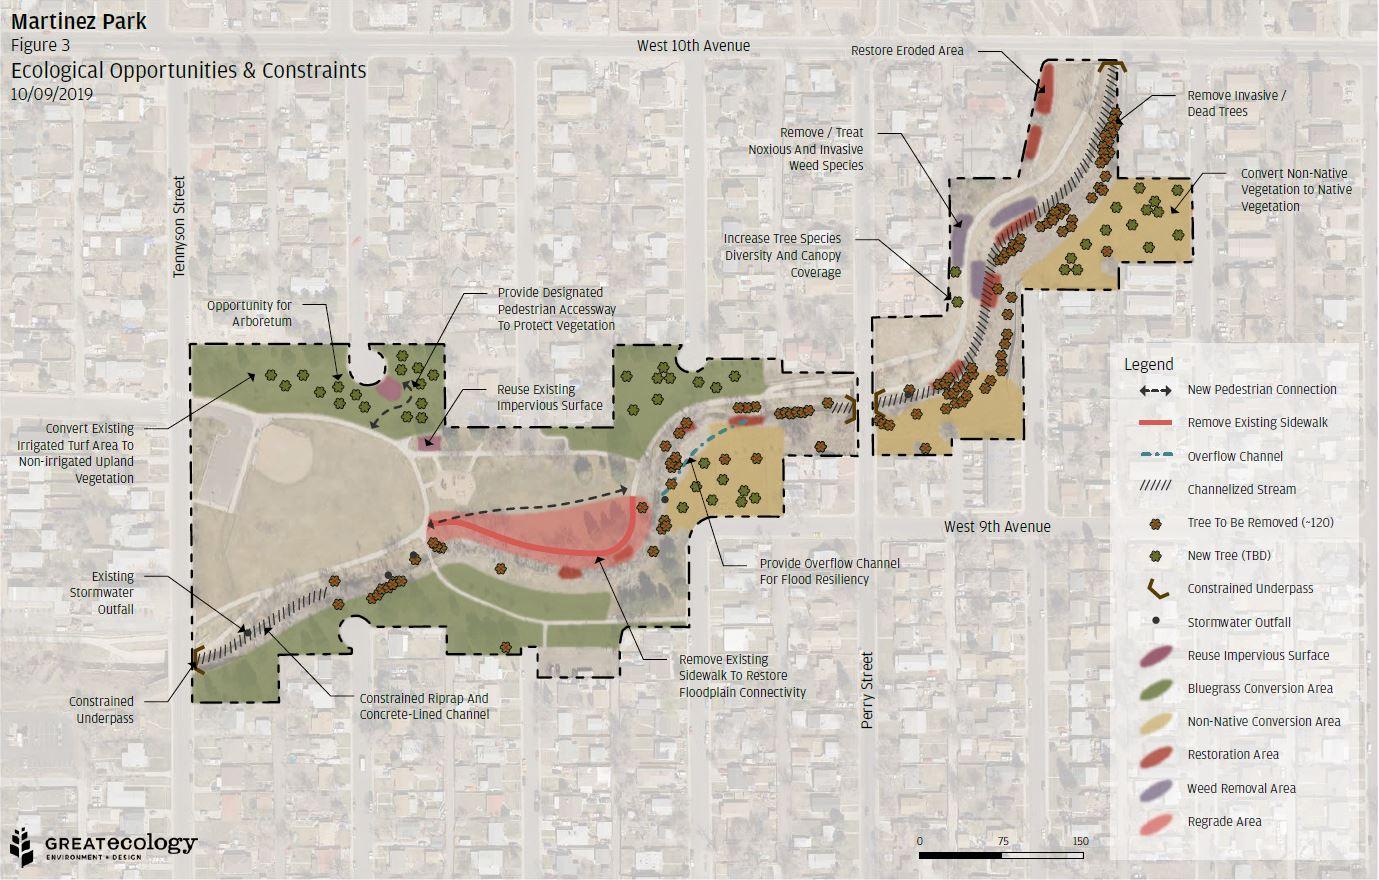 Martinez Park Opportunities & Constraints